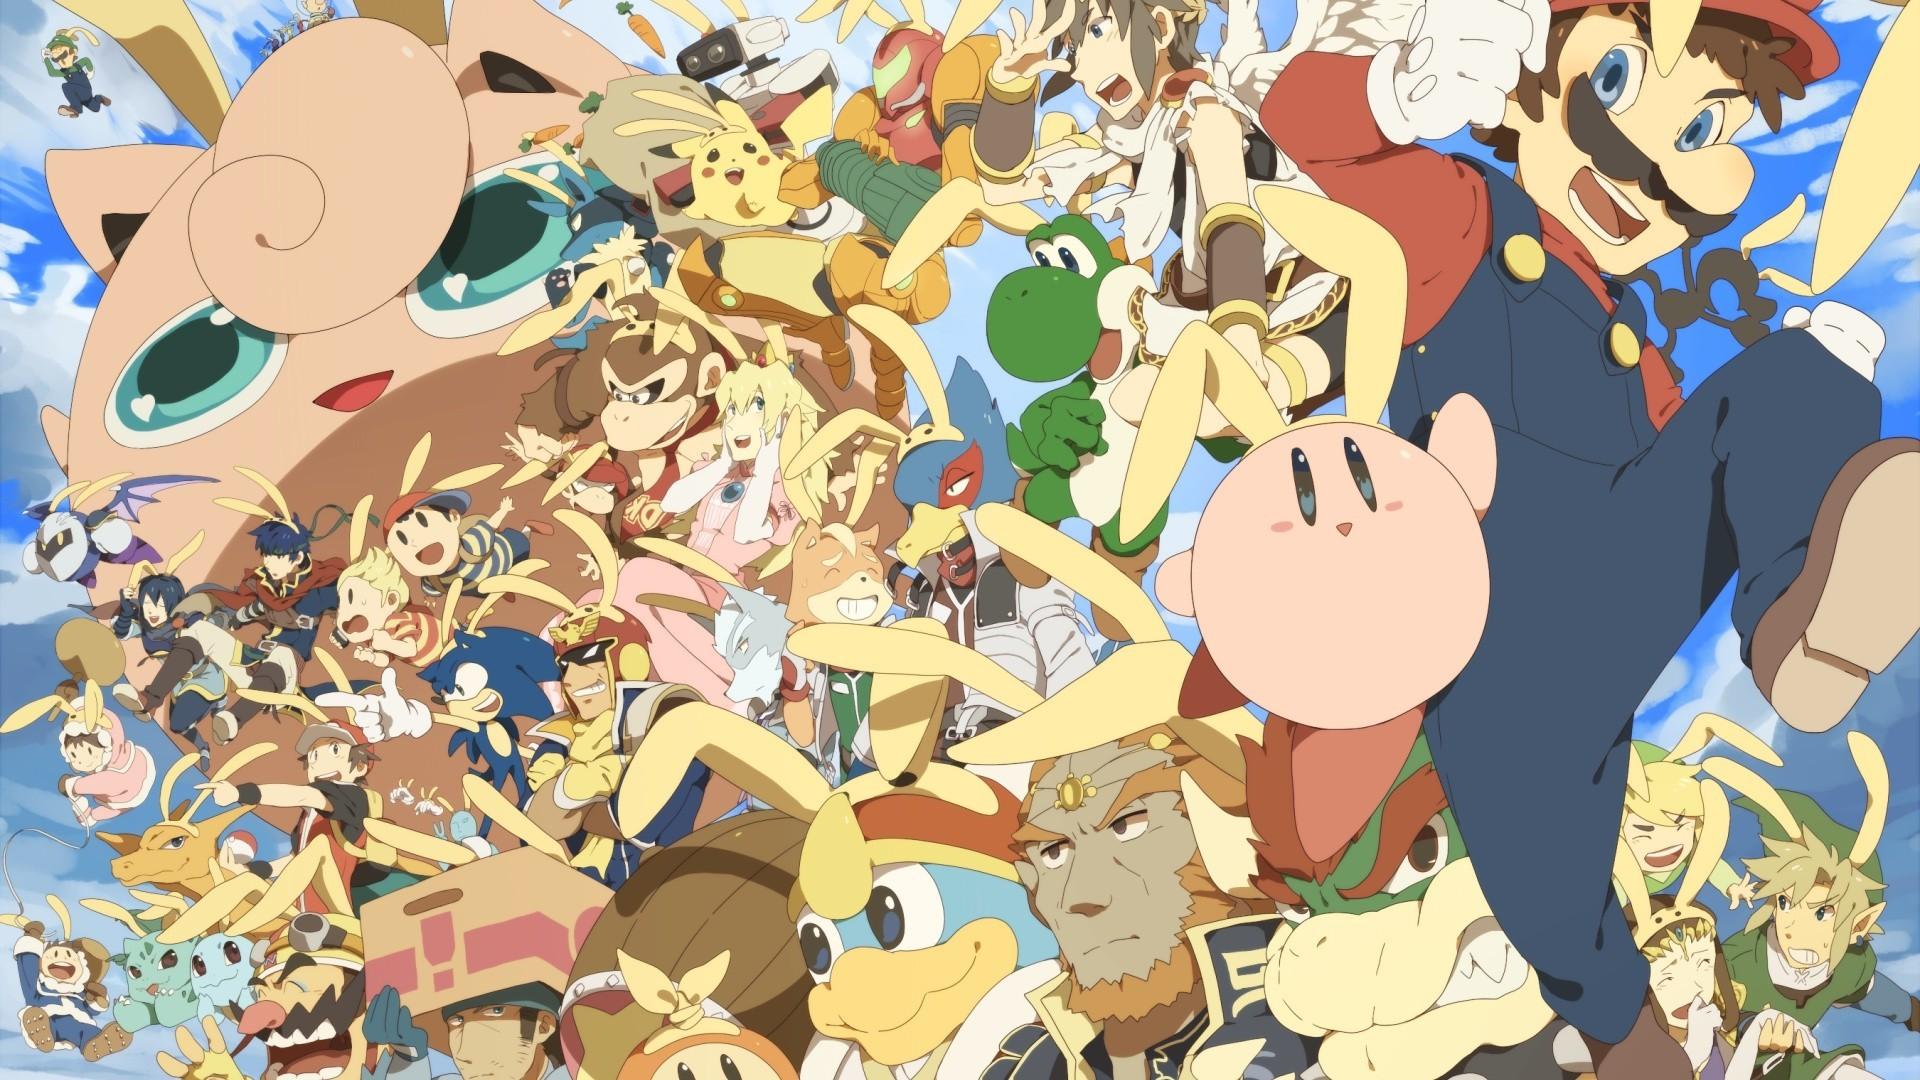 189 <b>Super Smash Bros</b>. HD <b>Wallpapers</b>   <b>Backgrounds</b> - <b>Wallpaper</b> Abyss